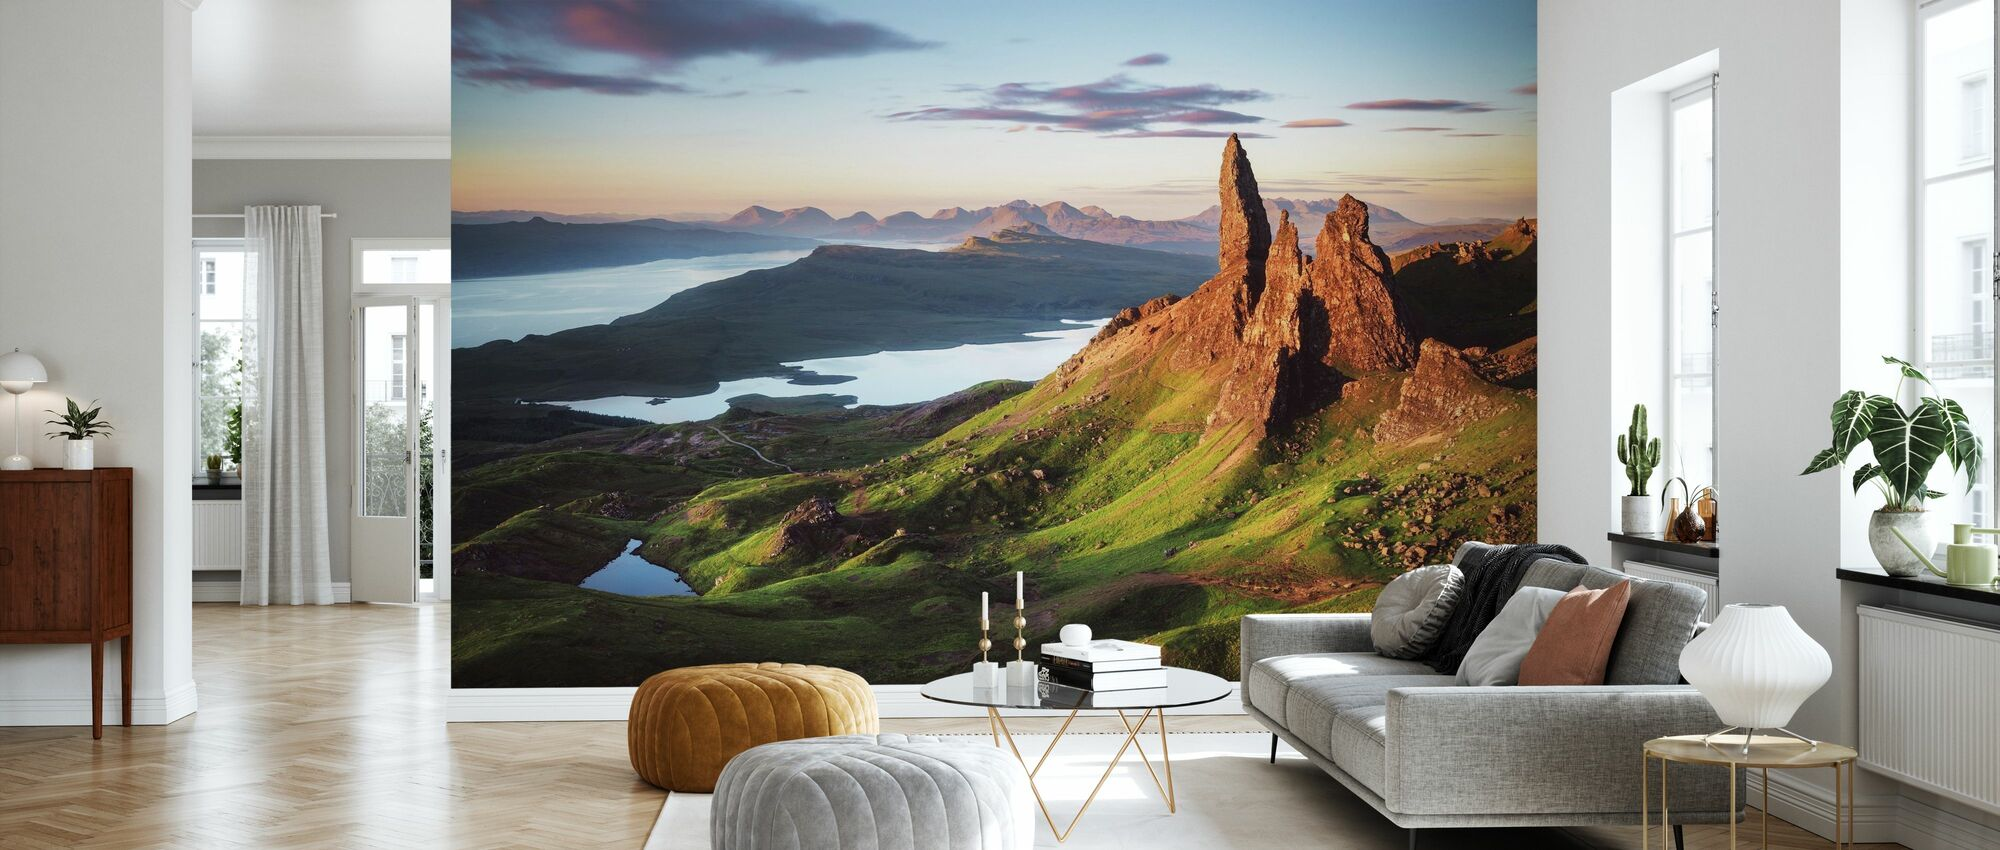 Scotland - Old Man of Storr - Wallpaper - Living Room